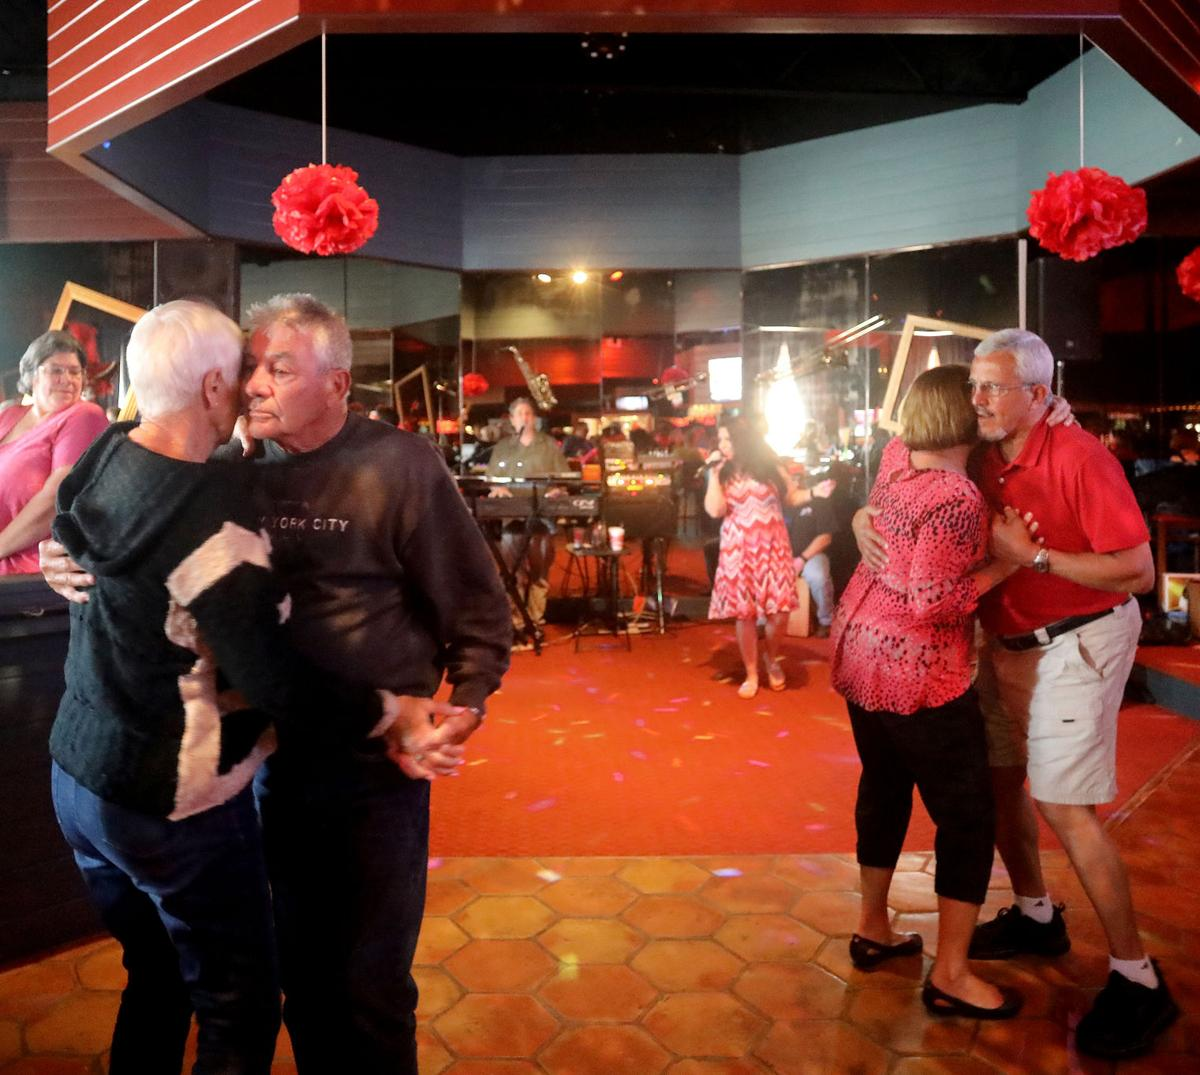 Carolina Seafood & Steak serves up fresh food, fun atmosphere